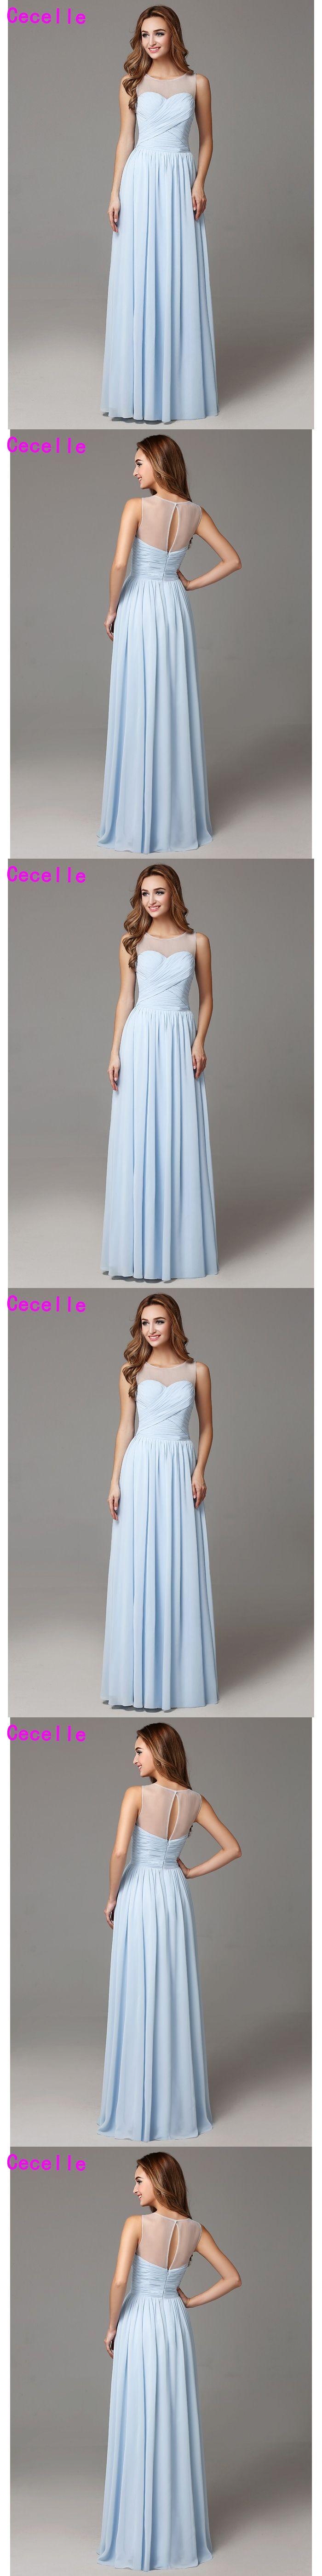 2017 Light Blue Long Bridesmaid Dresses Floor Length Sleeveless Pleats Chiffon Country Bridesmaid Gowns Wedding Party Dress